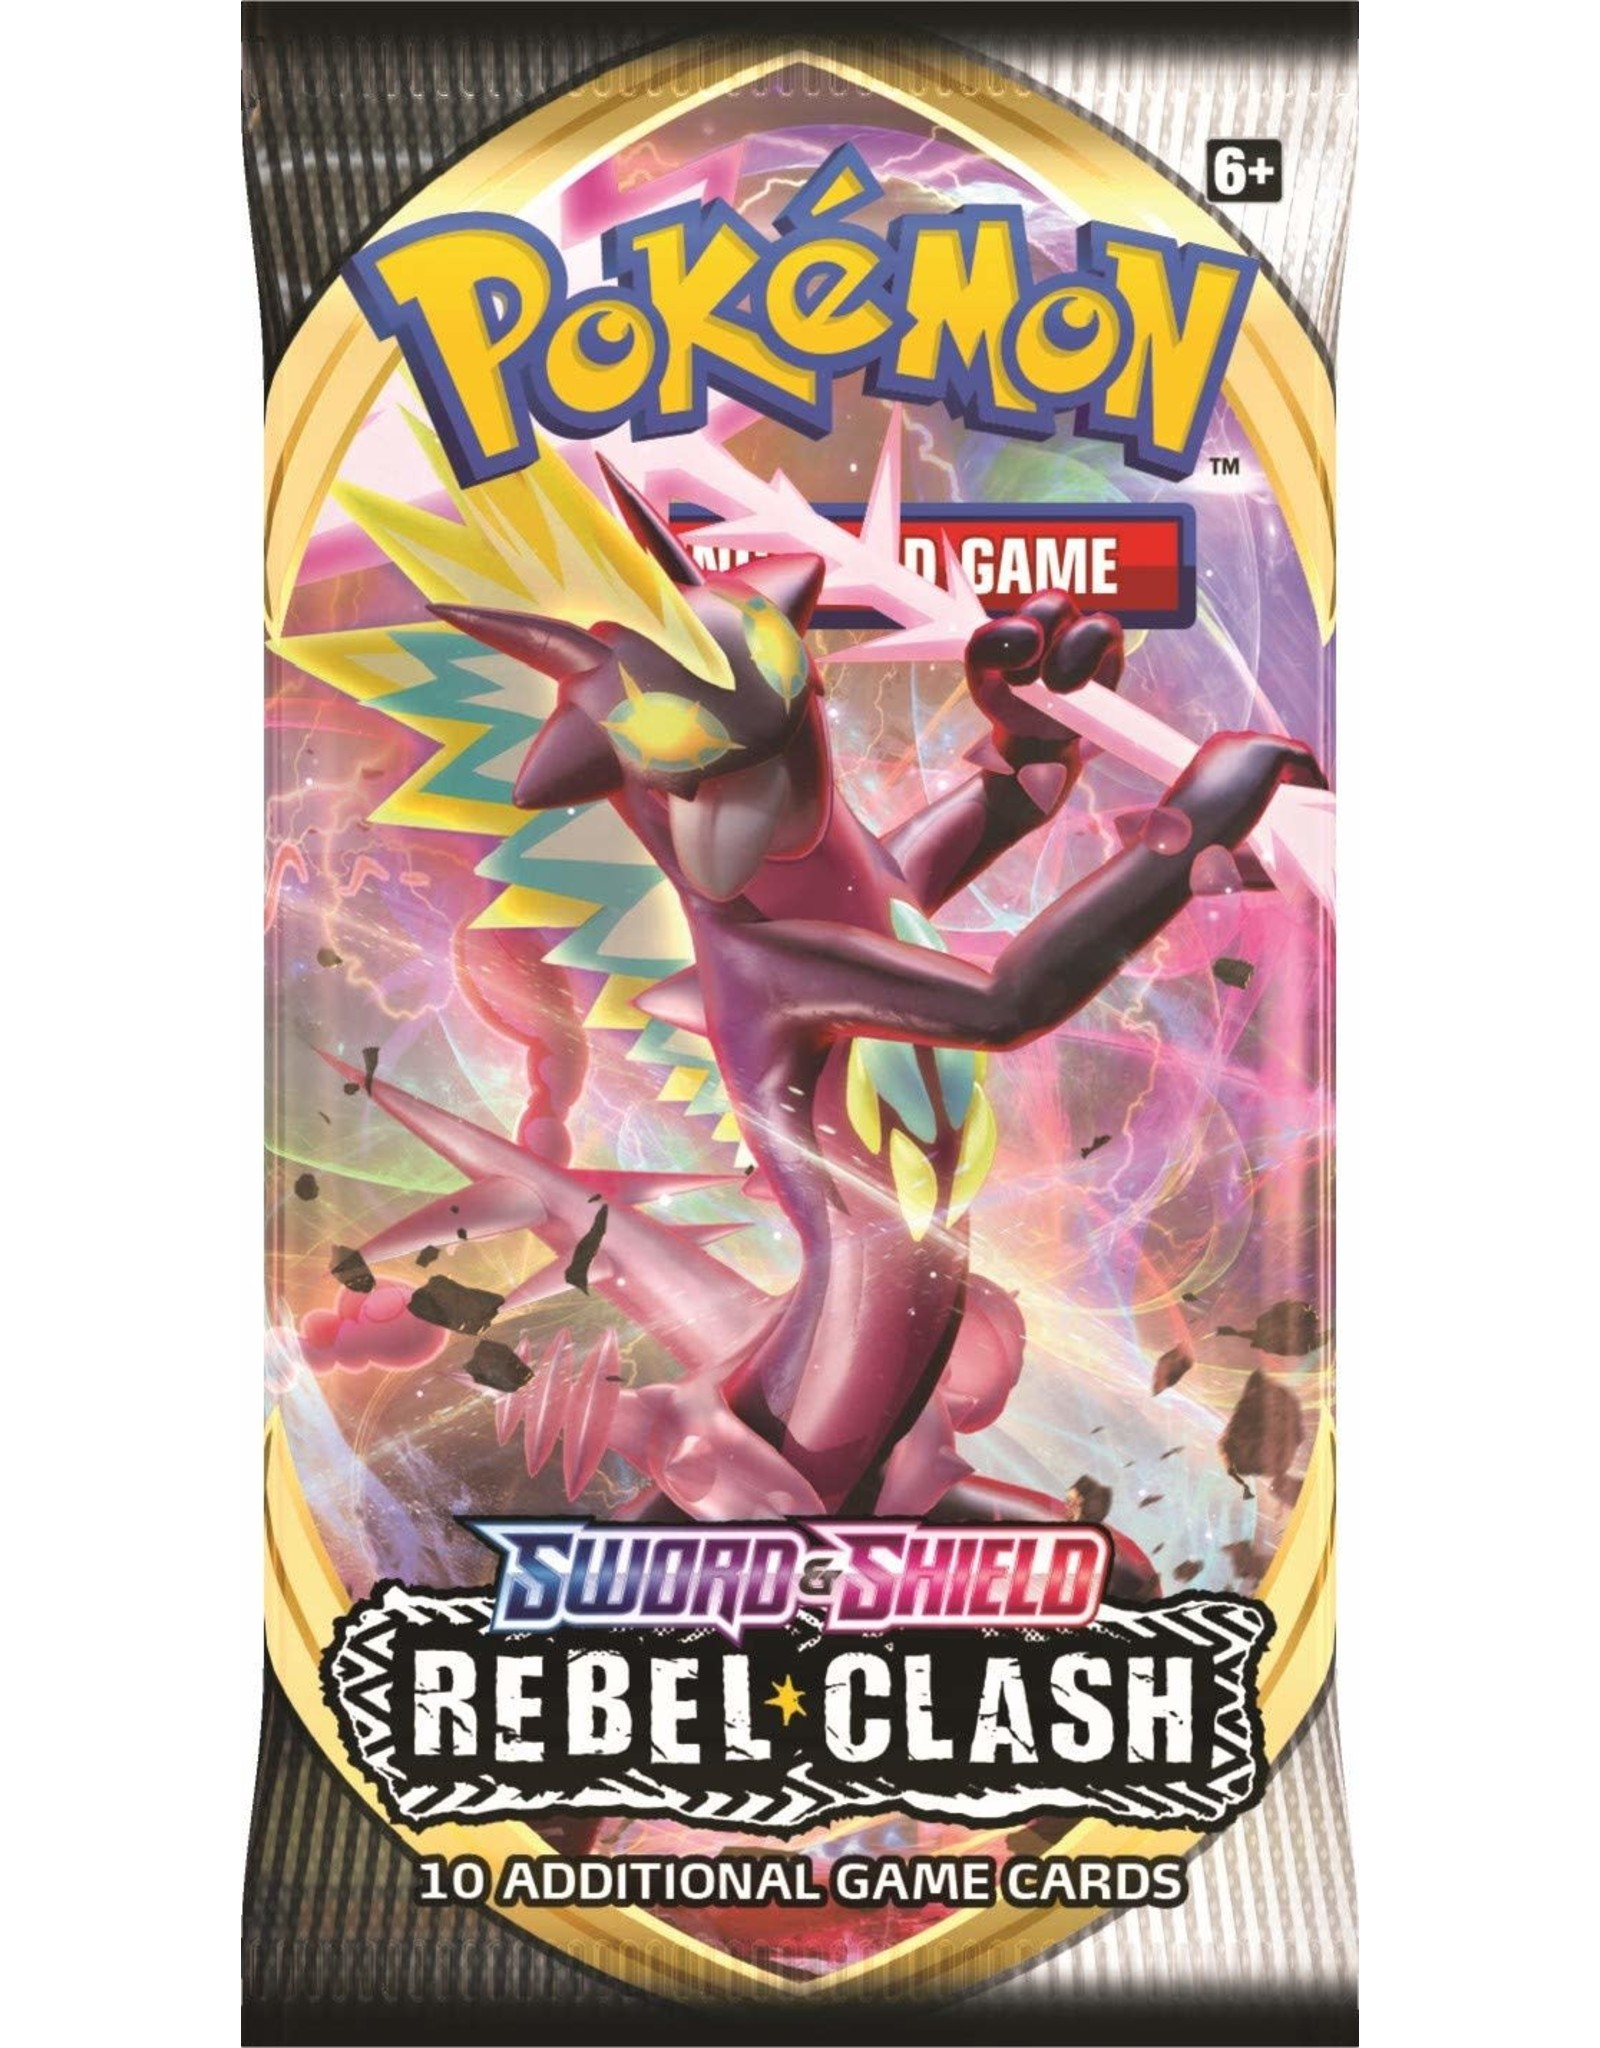 Pokemon TCG - Sword & Shield Rebel Clash Booster